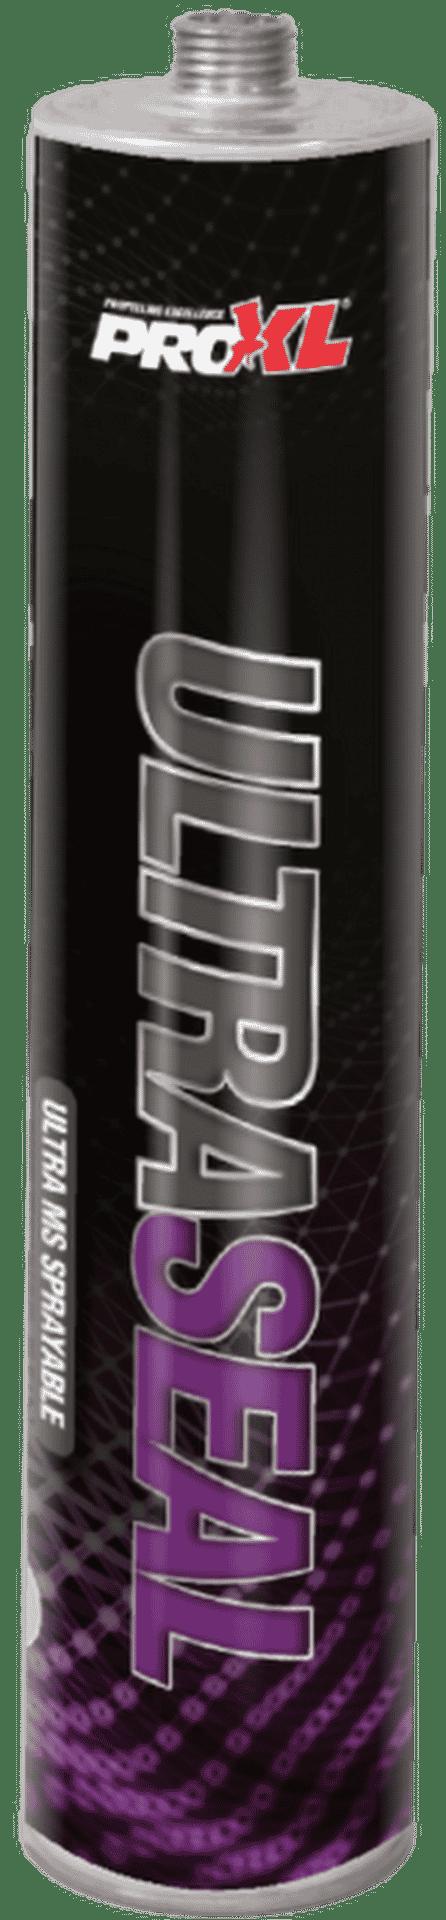 Ultra MS Sprayable Sealer- Black (290ml) Product Image